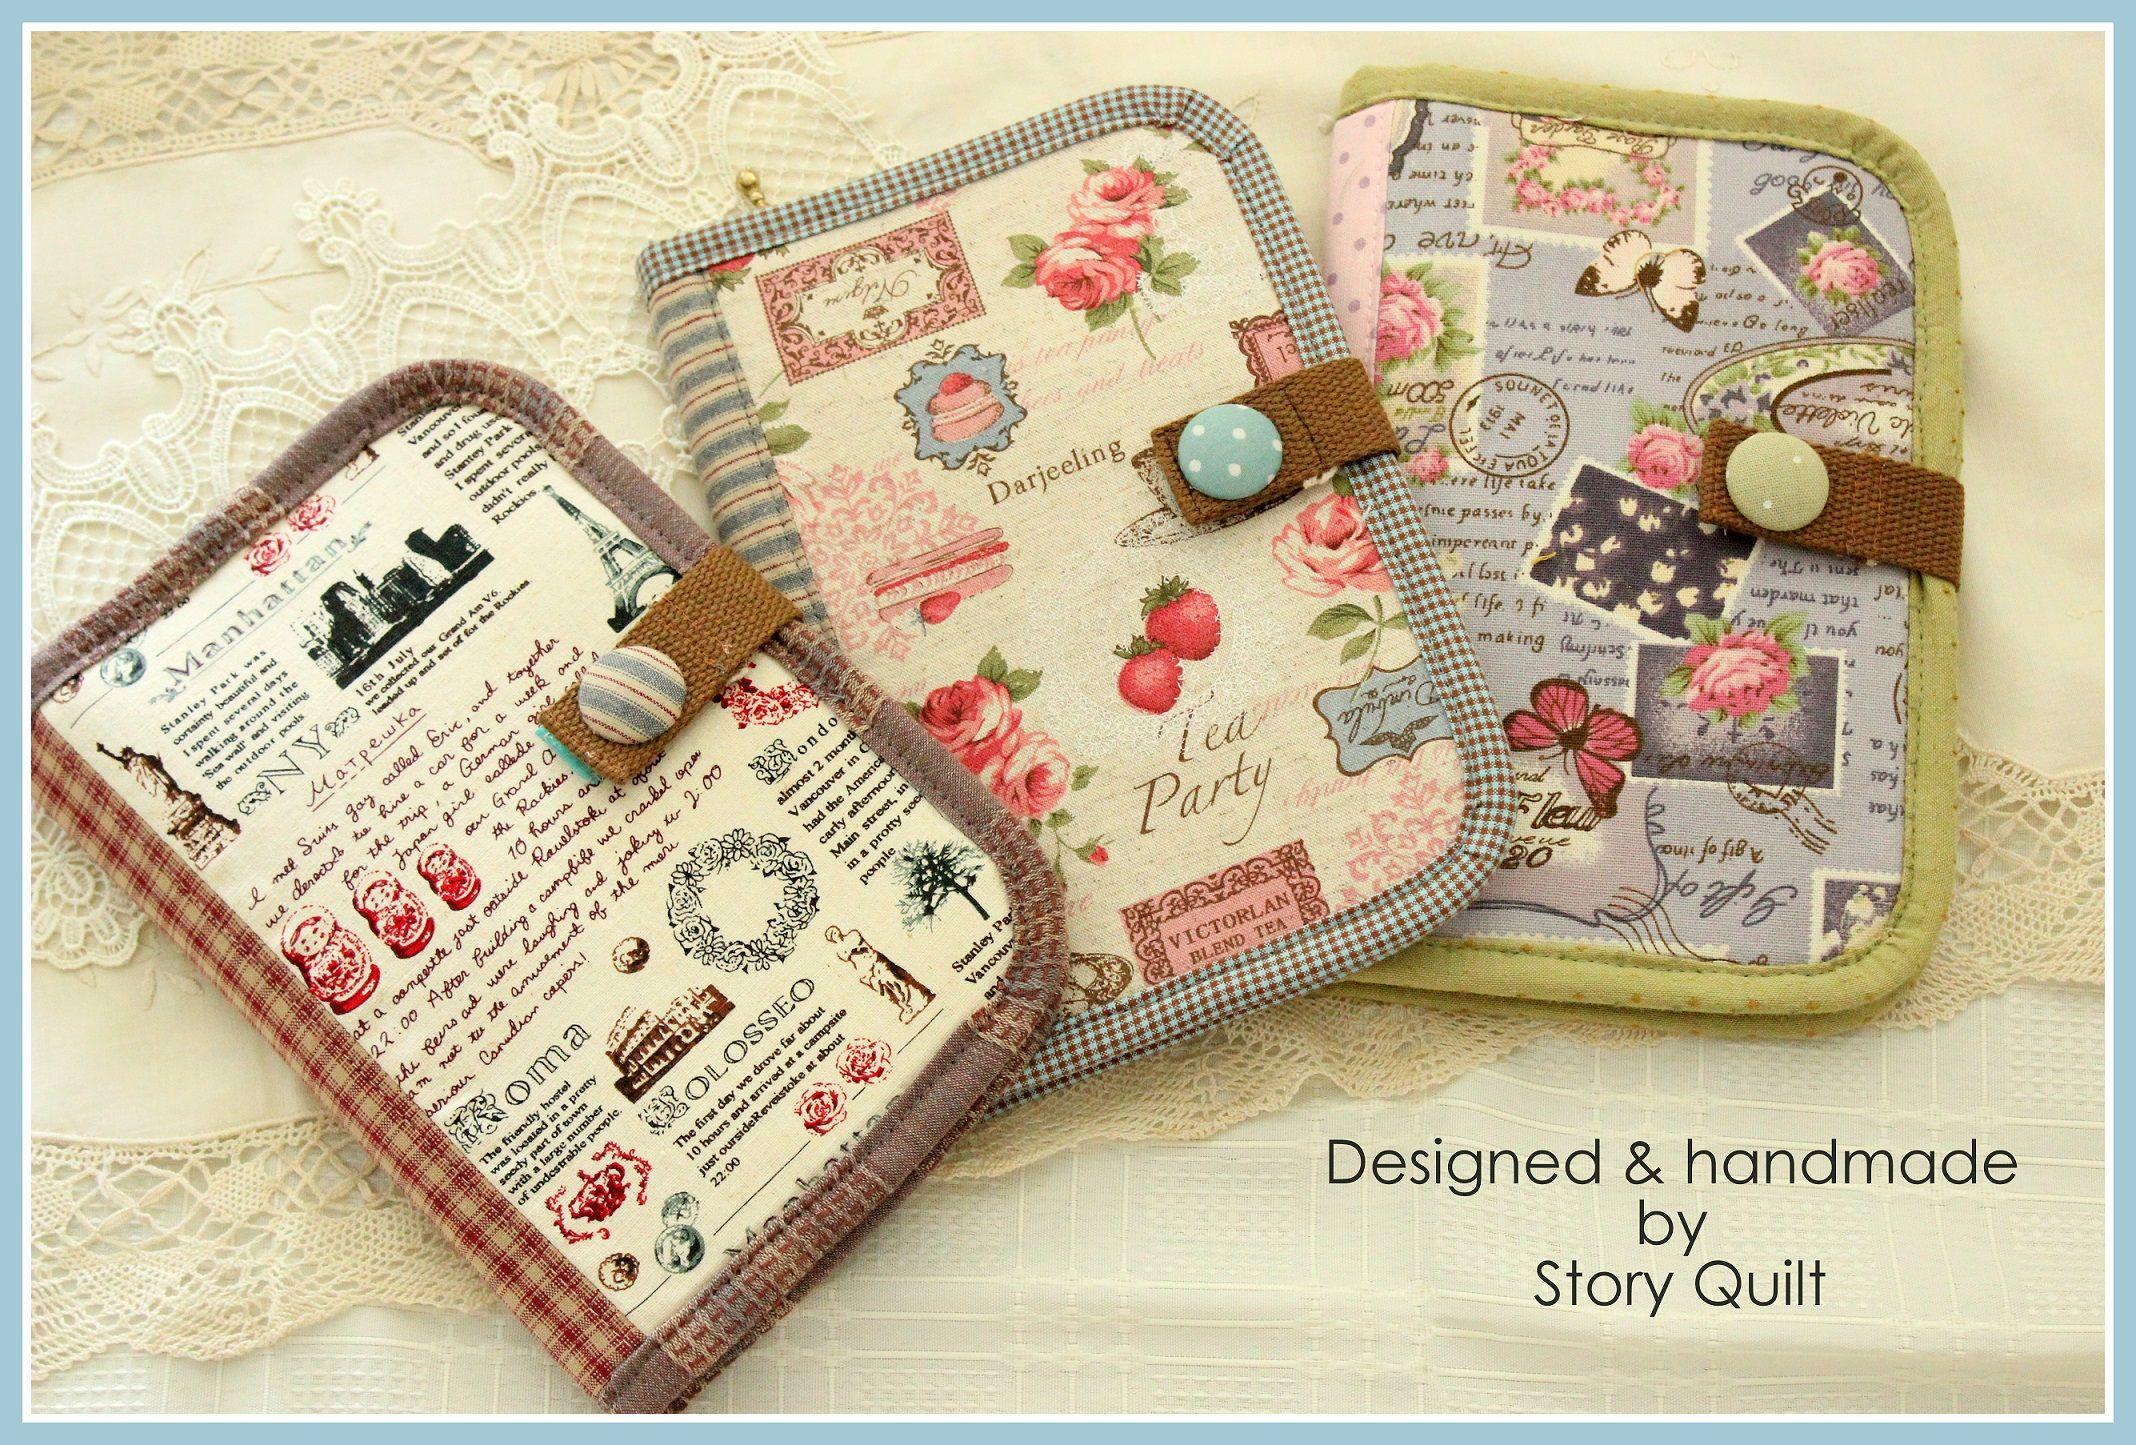 Book Cover Sewing Zip Code : Organizer tutorial travel purse handmade